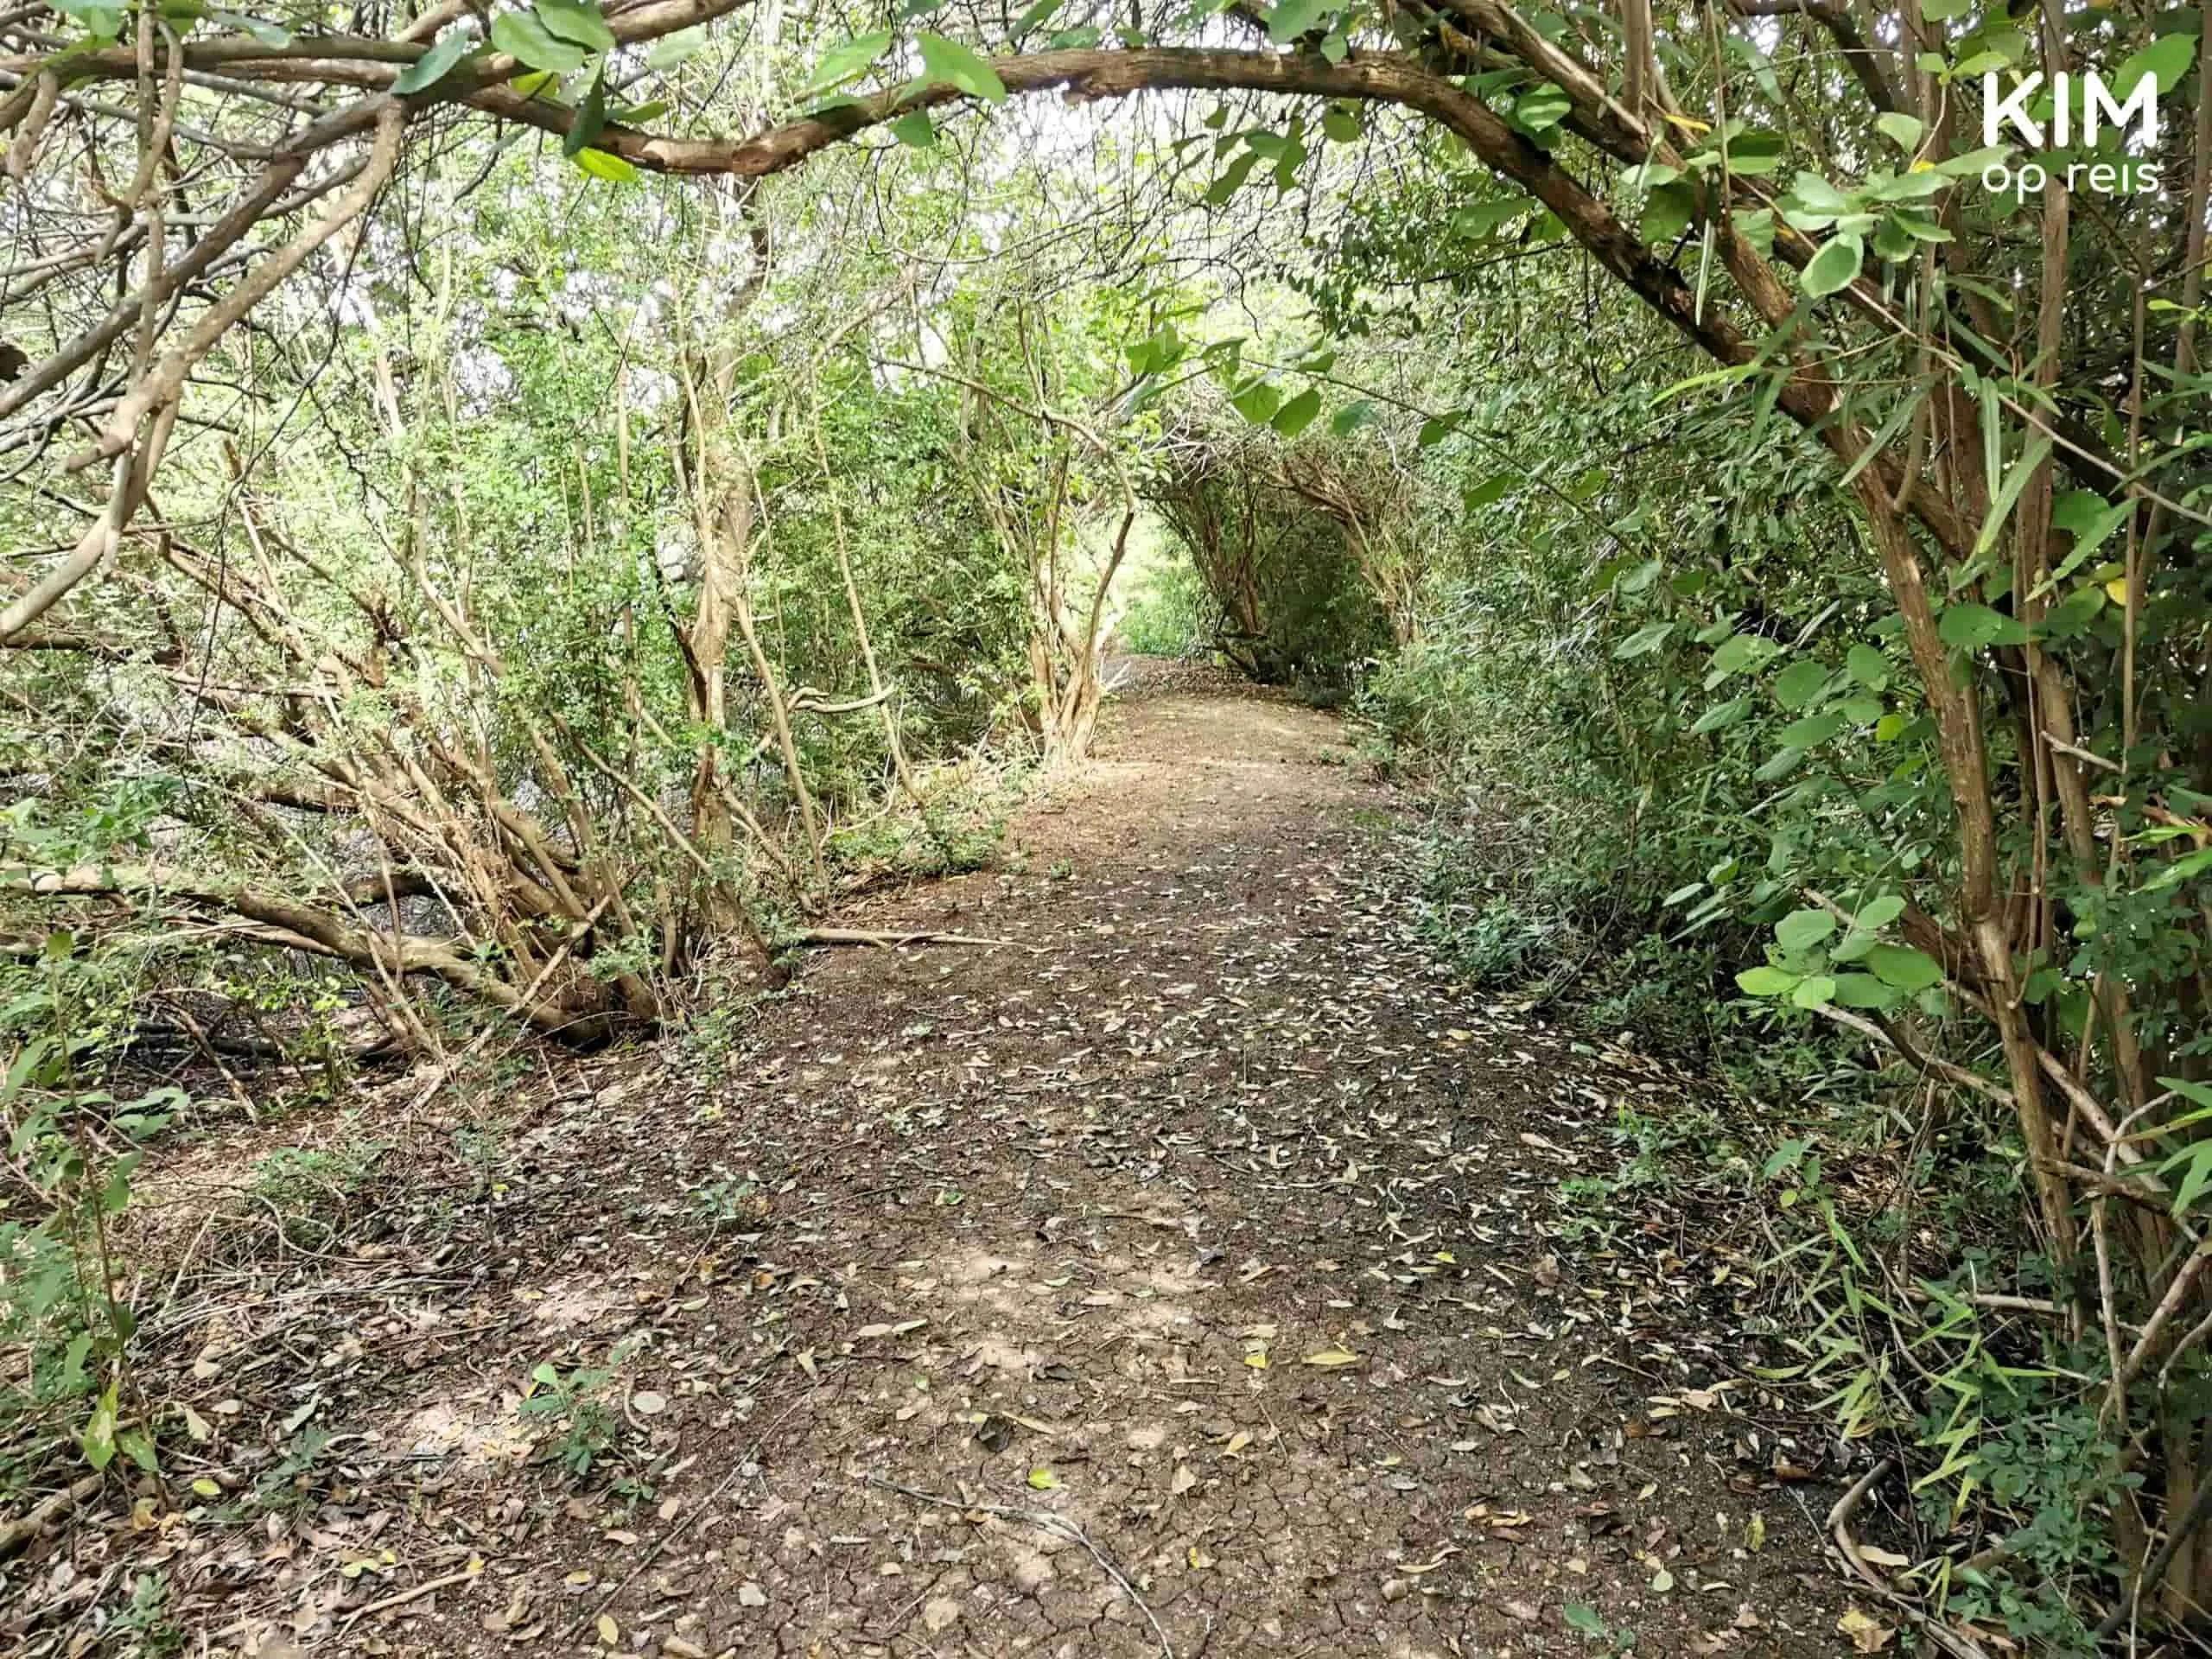 Tuin wandelen Landhuis Bloemhof: begroeid wandelpad